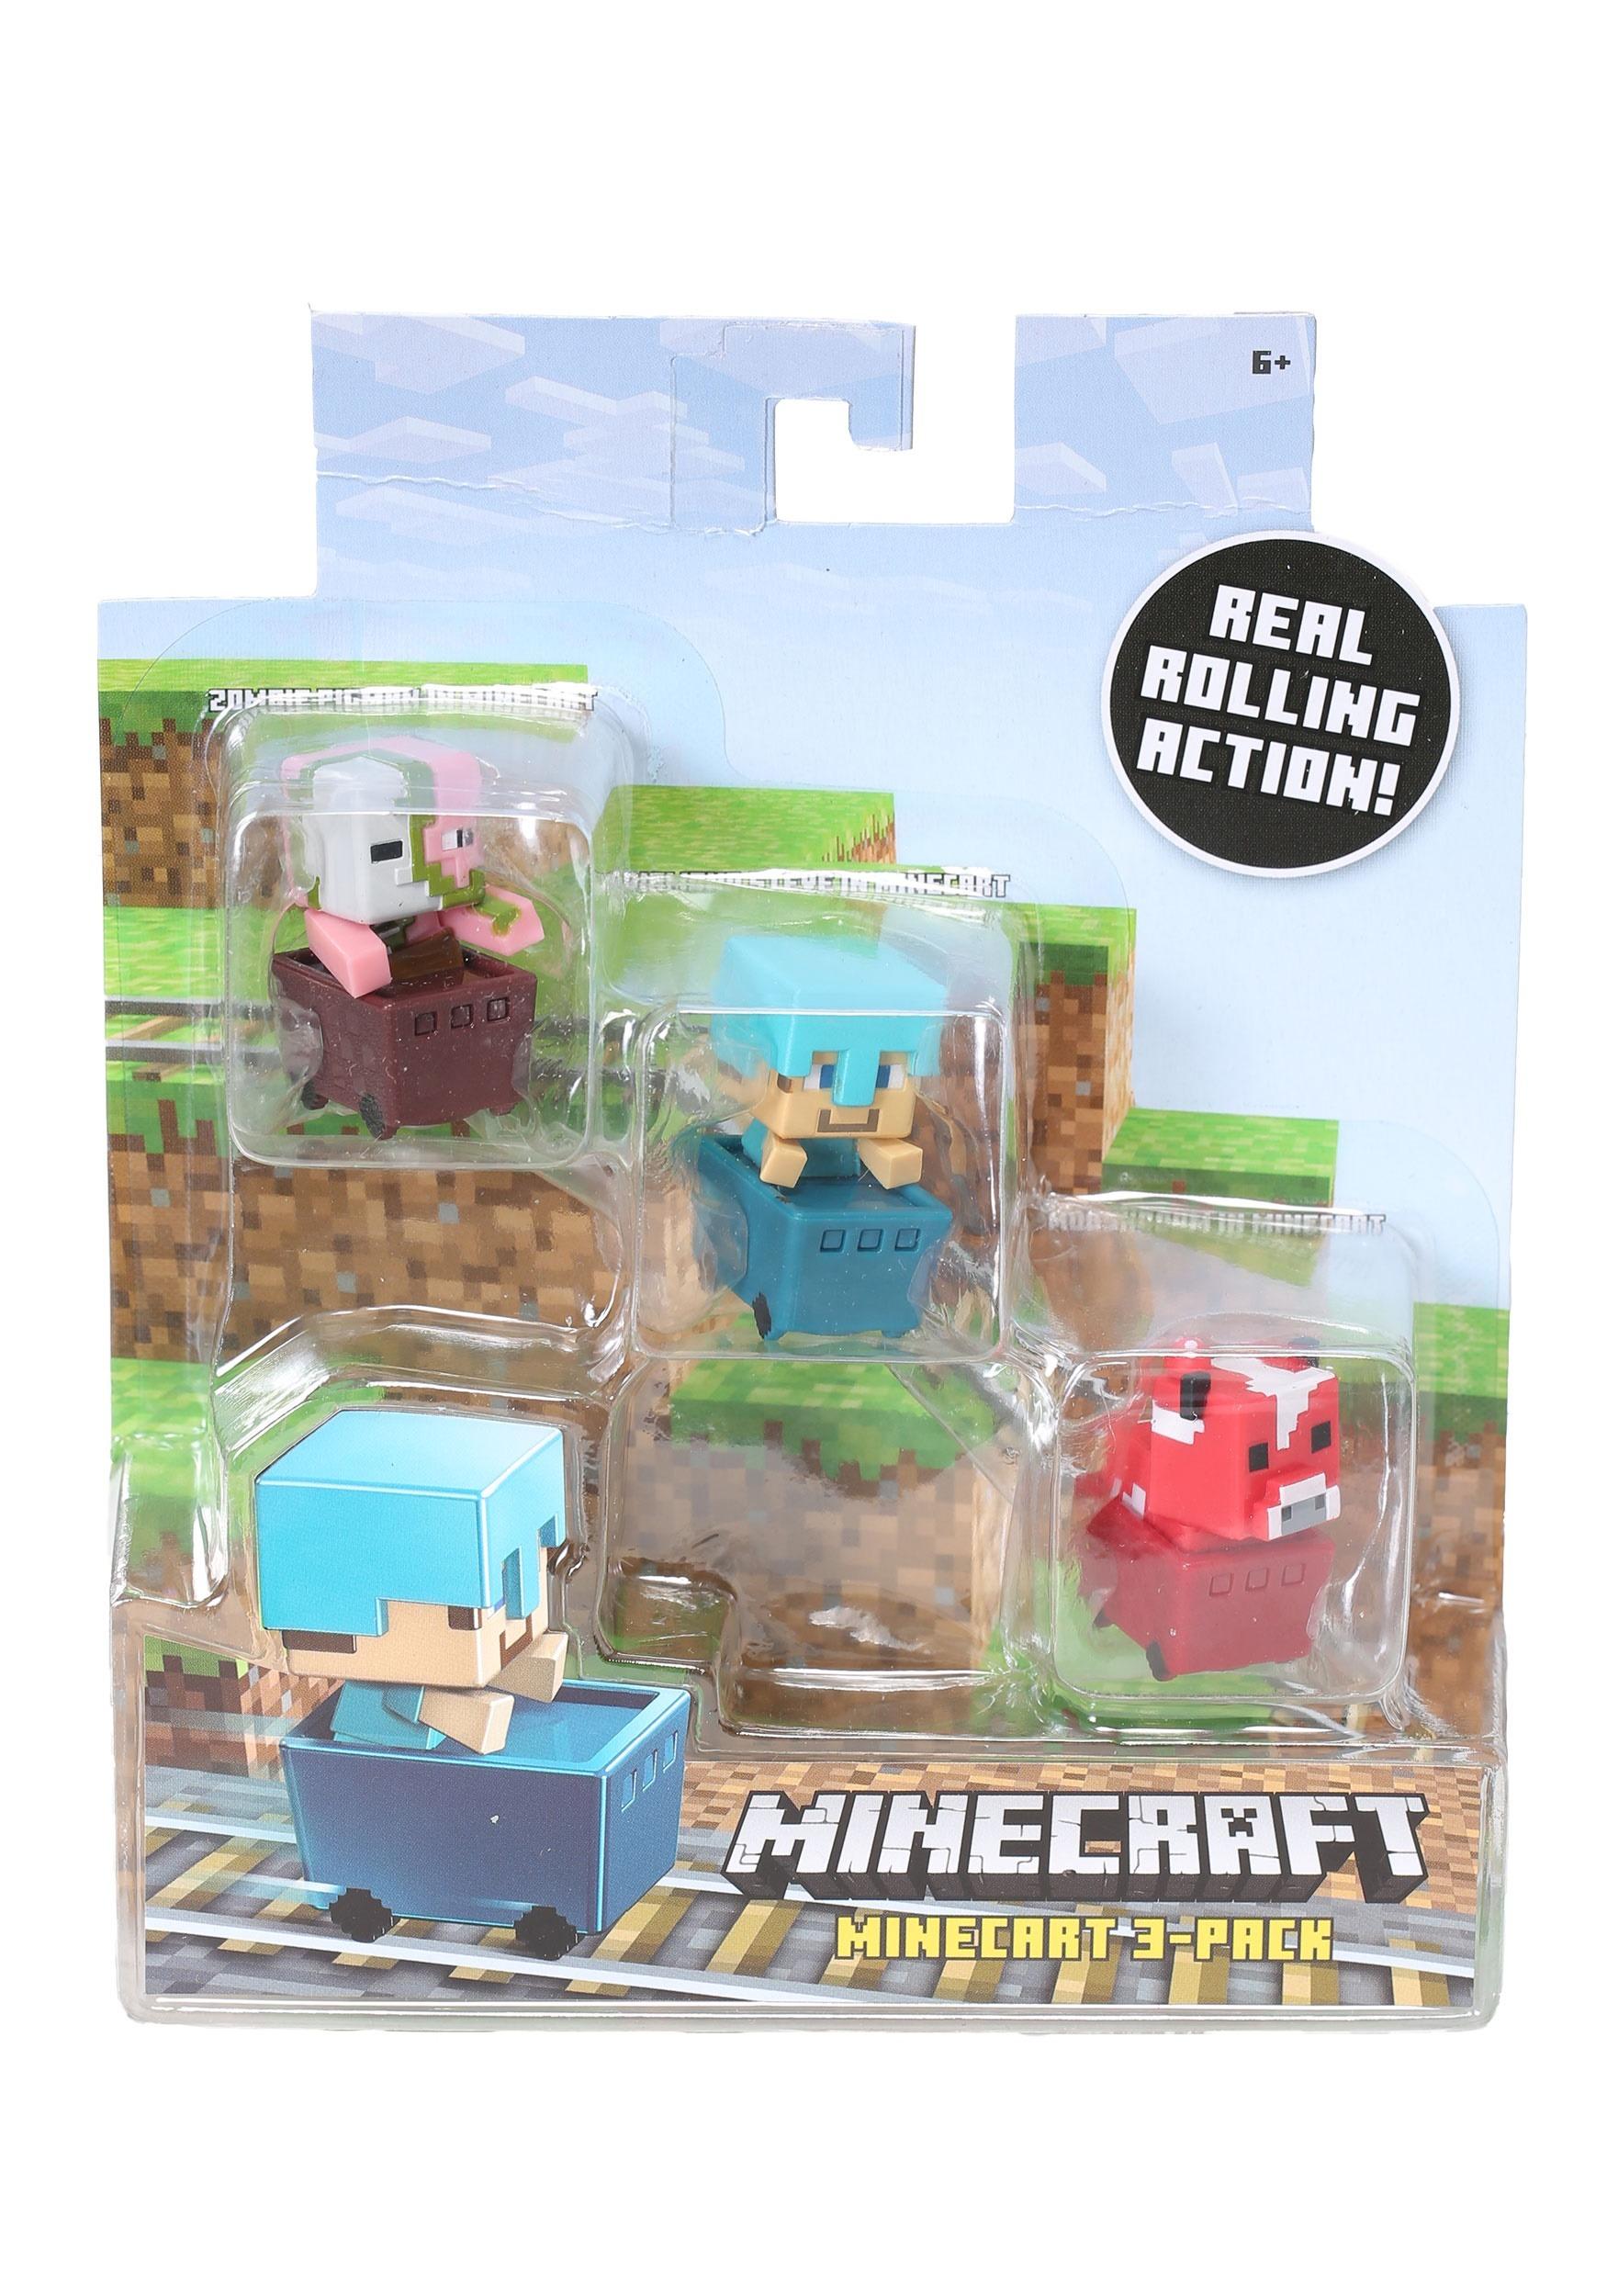 Minecraft Ocelot, Zombie, Enderman Figure 3 Pack MLFFK80